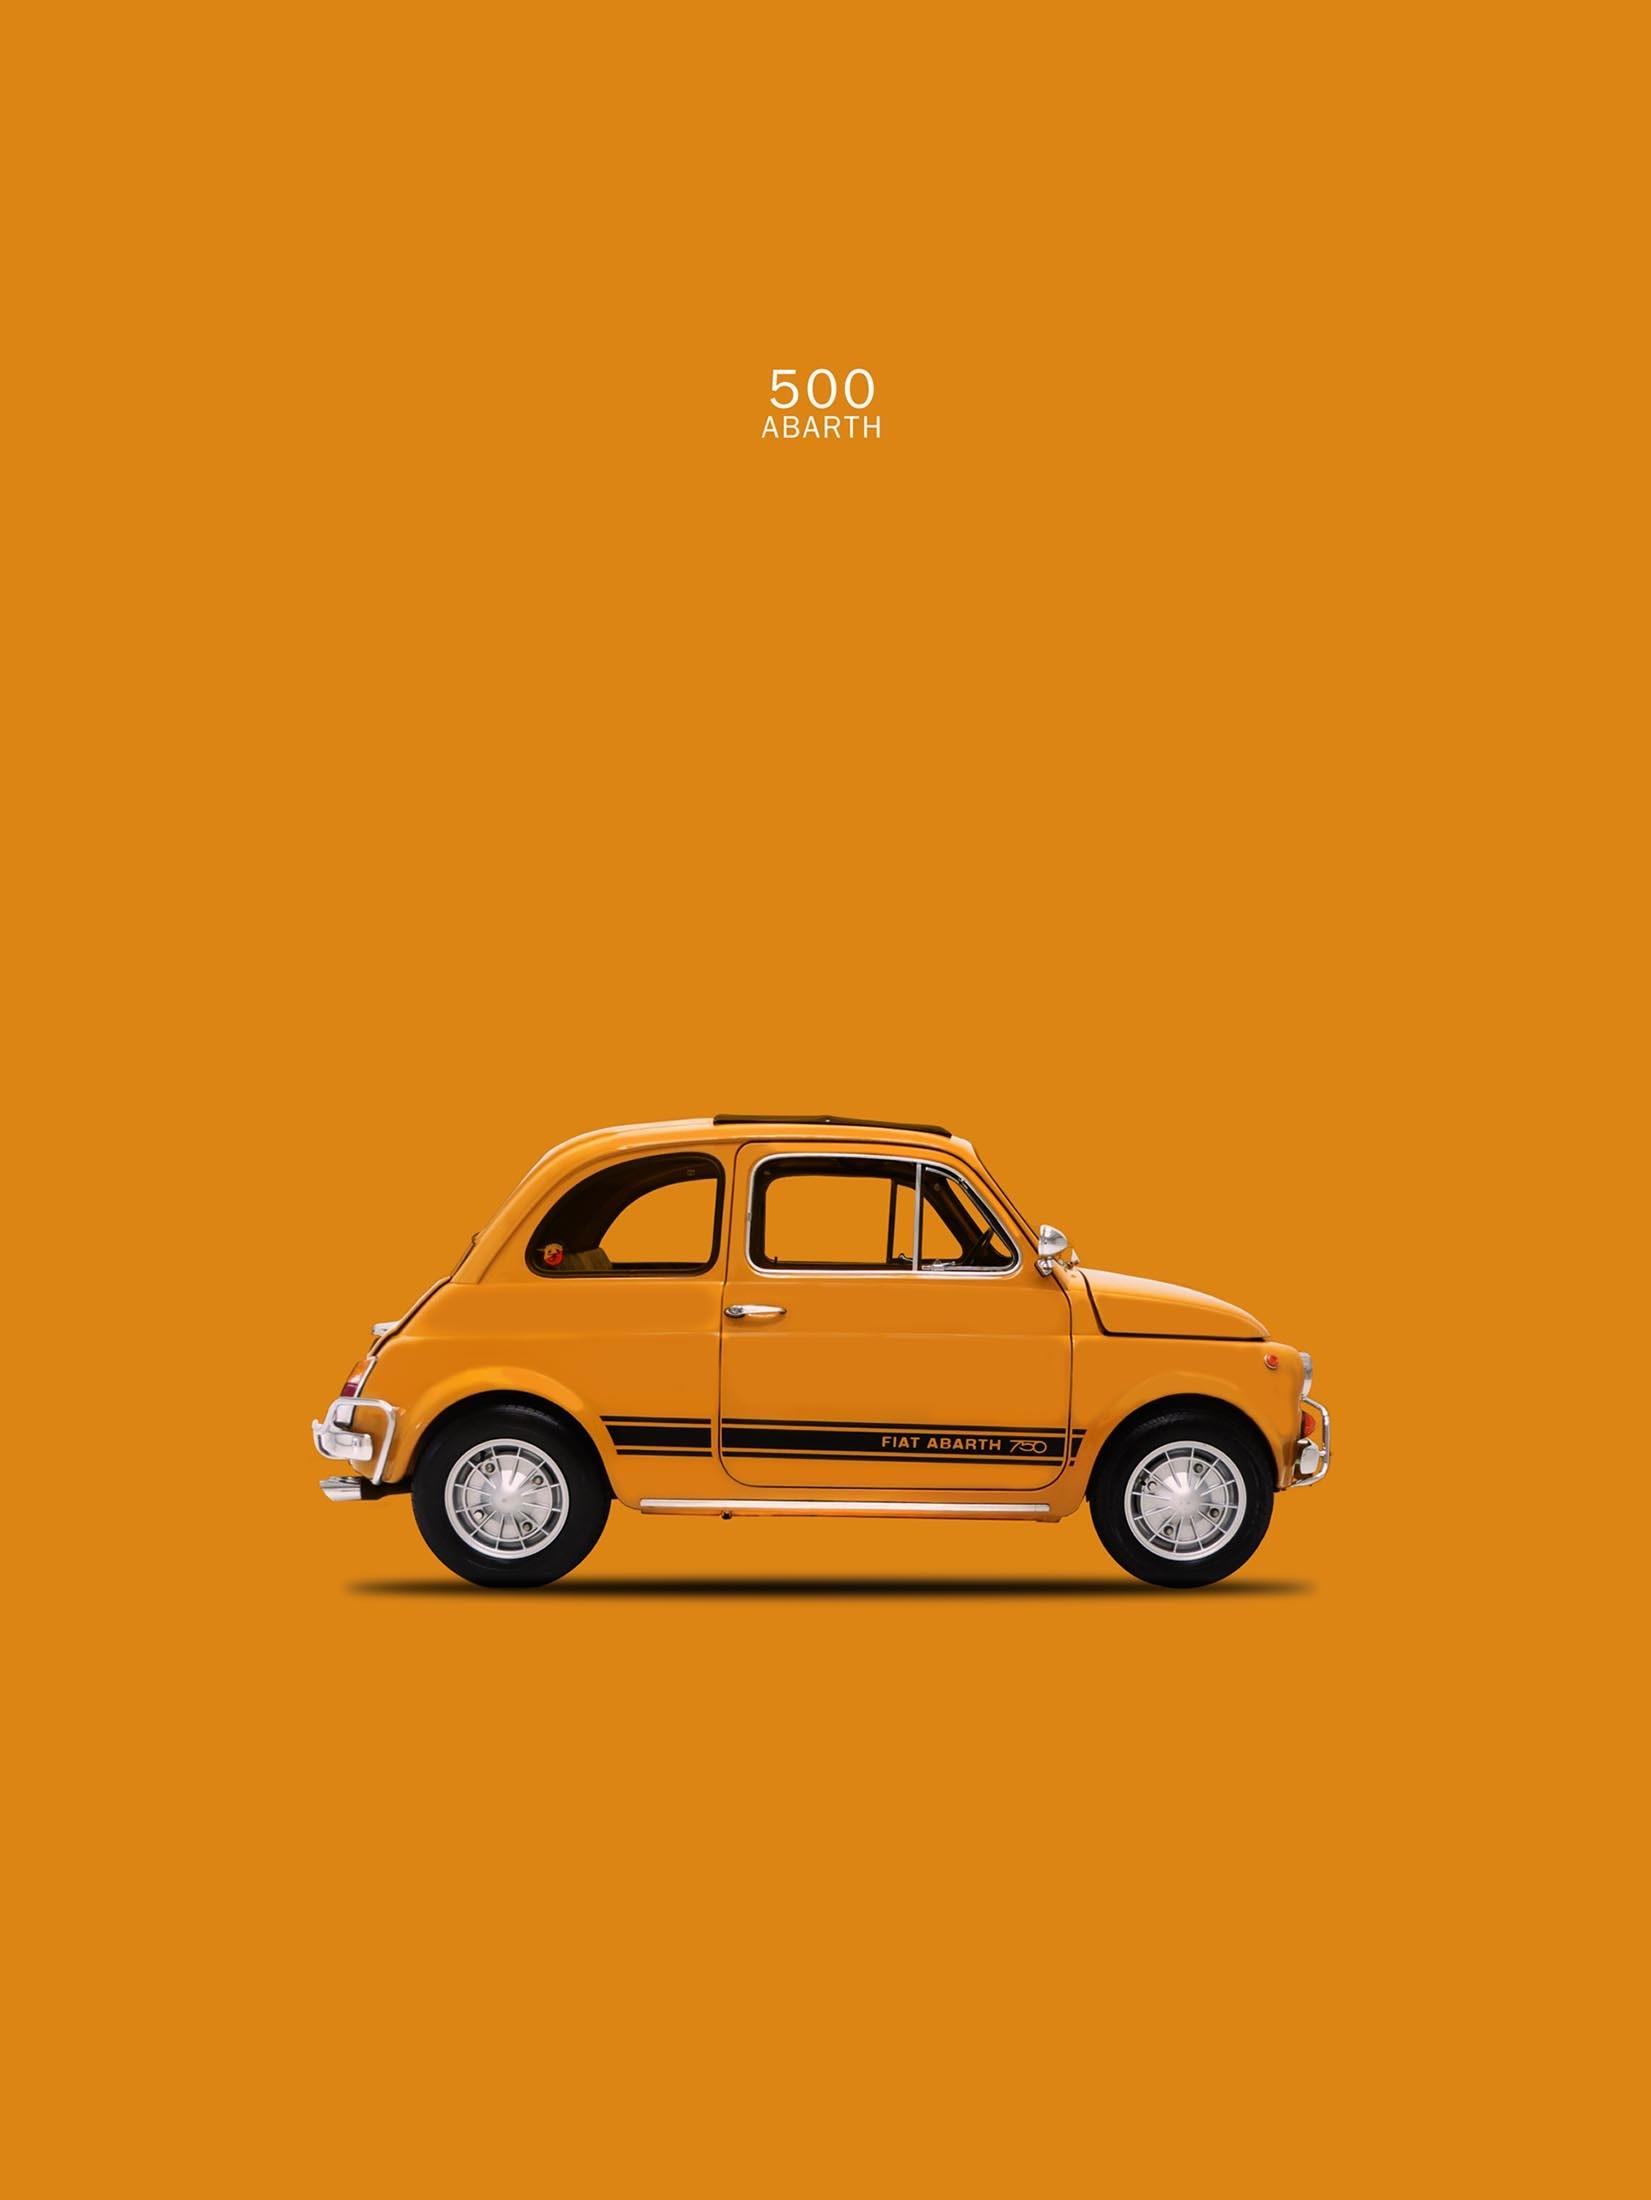 Fiat 500 Abarth 1969